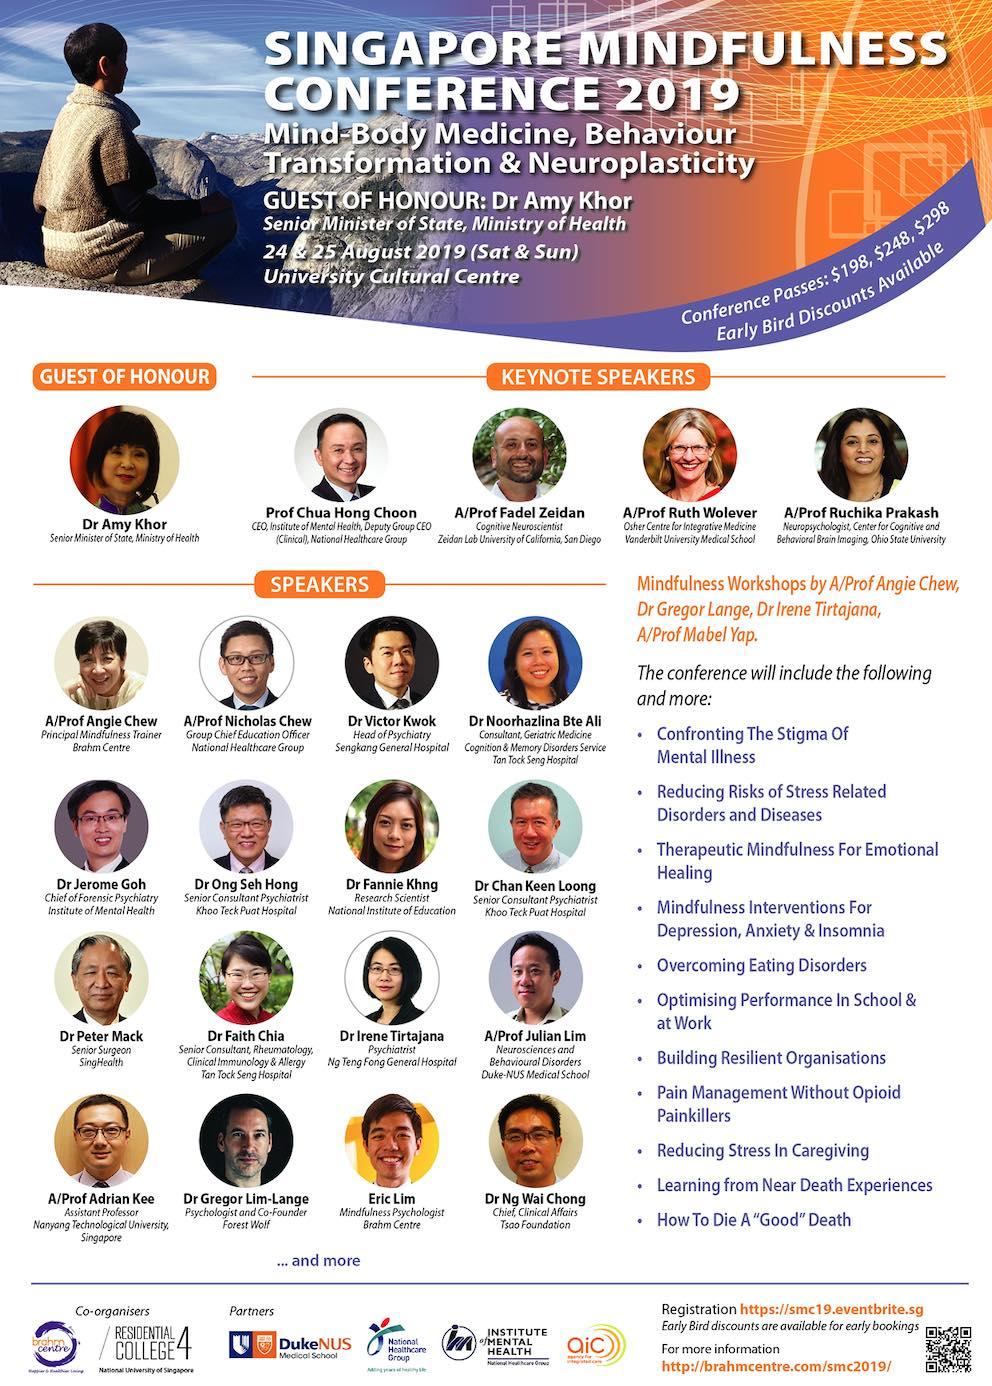 SINGAPORE MINDFULNESS CONFERENCE 2019 Aug 24-25 (2 days